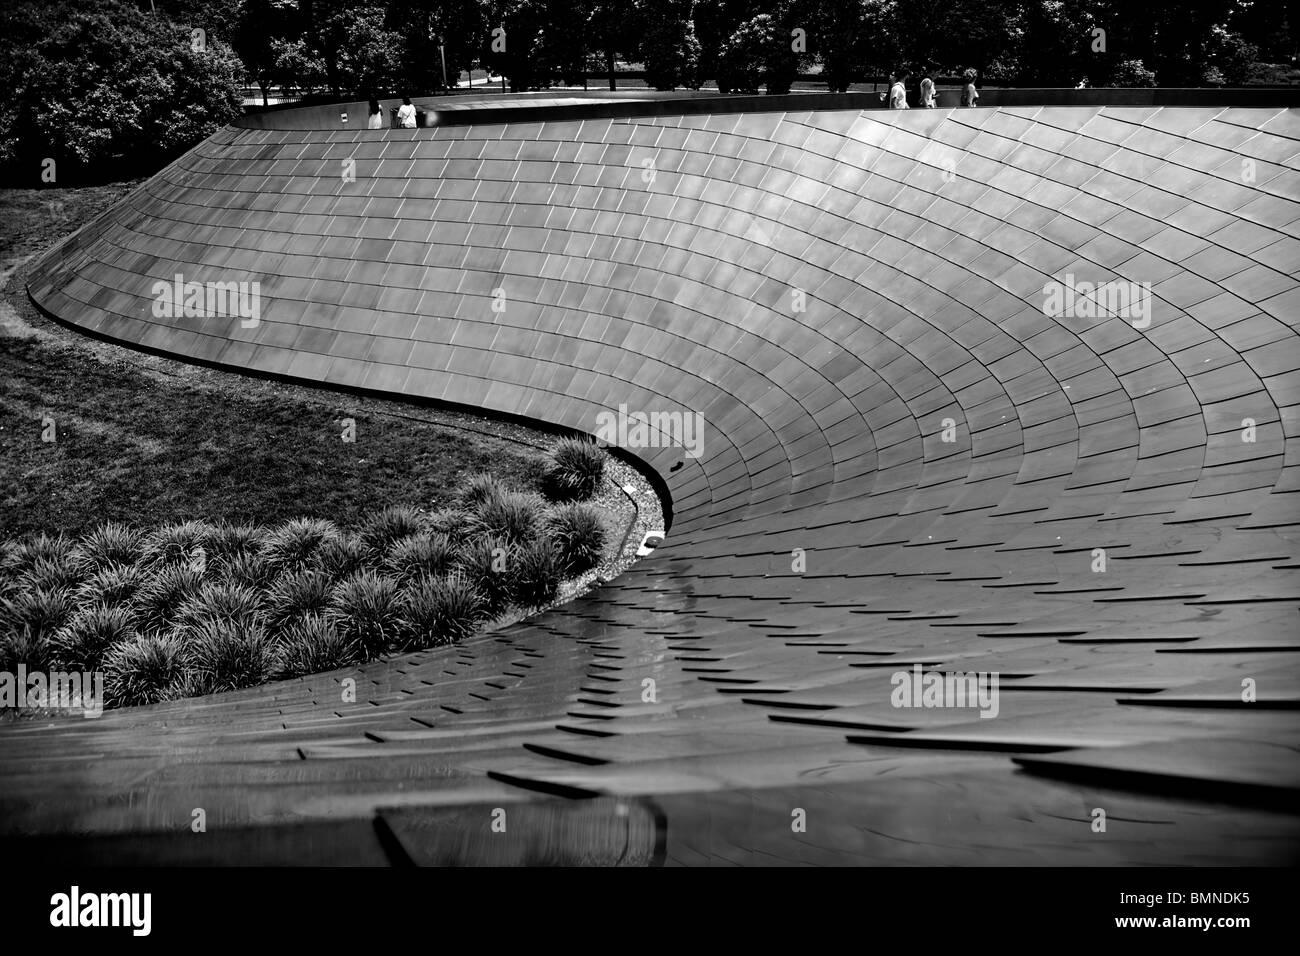 Downtown Chicago Millenium BP bridge - Stock Image